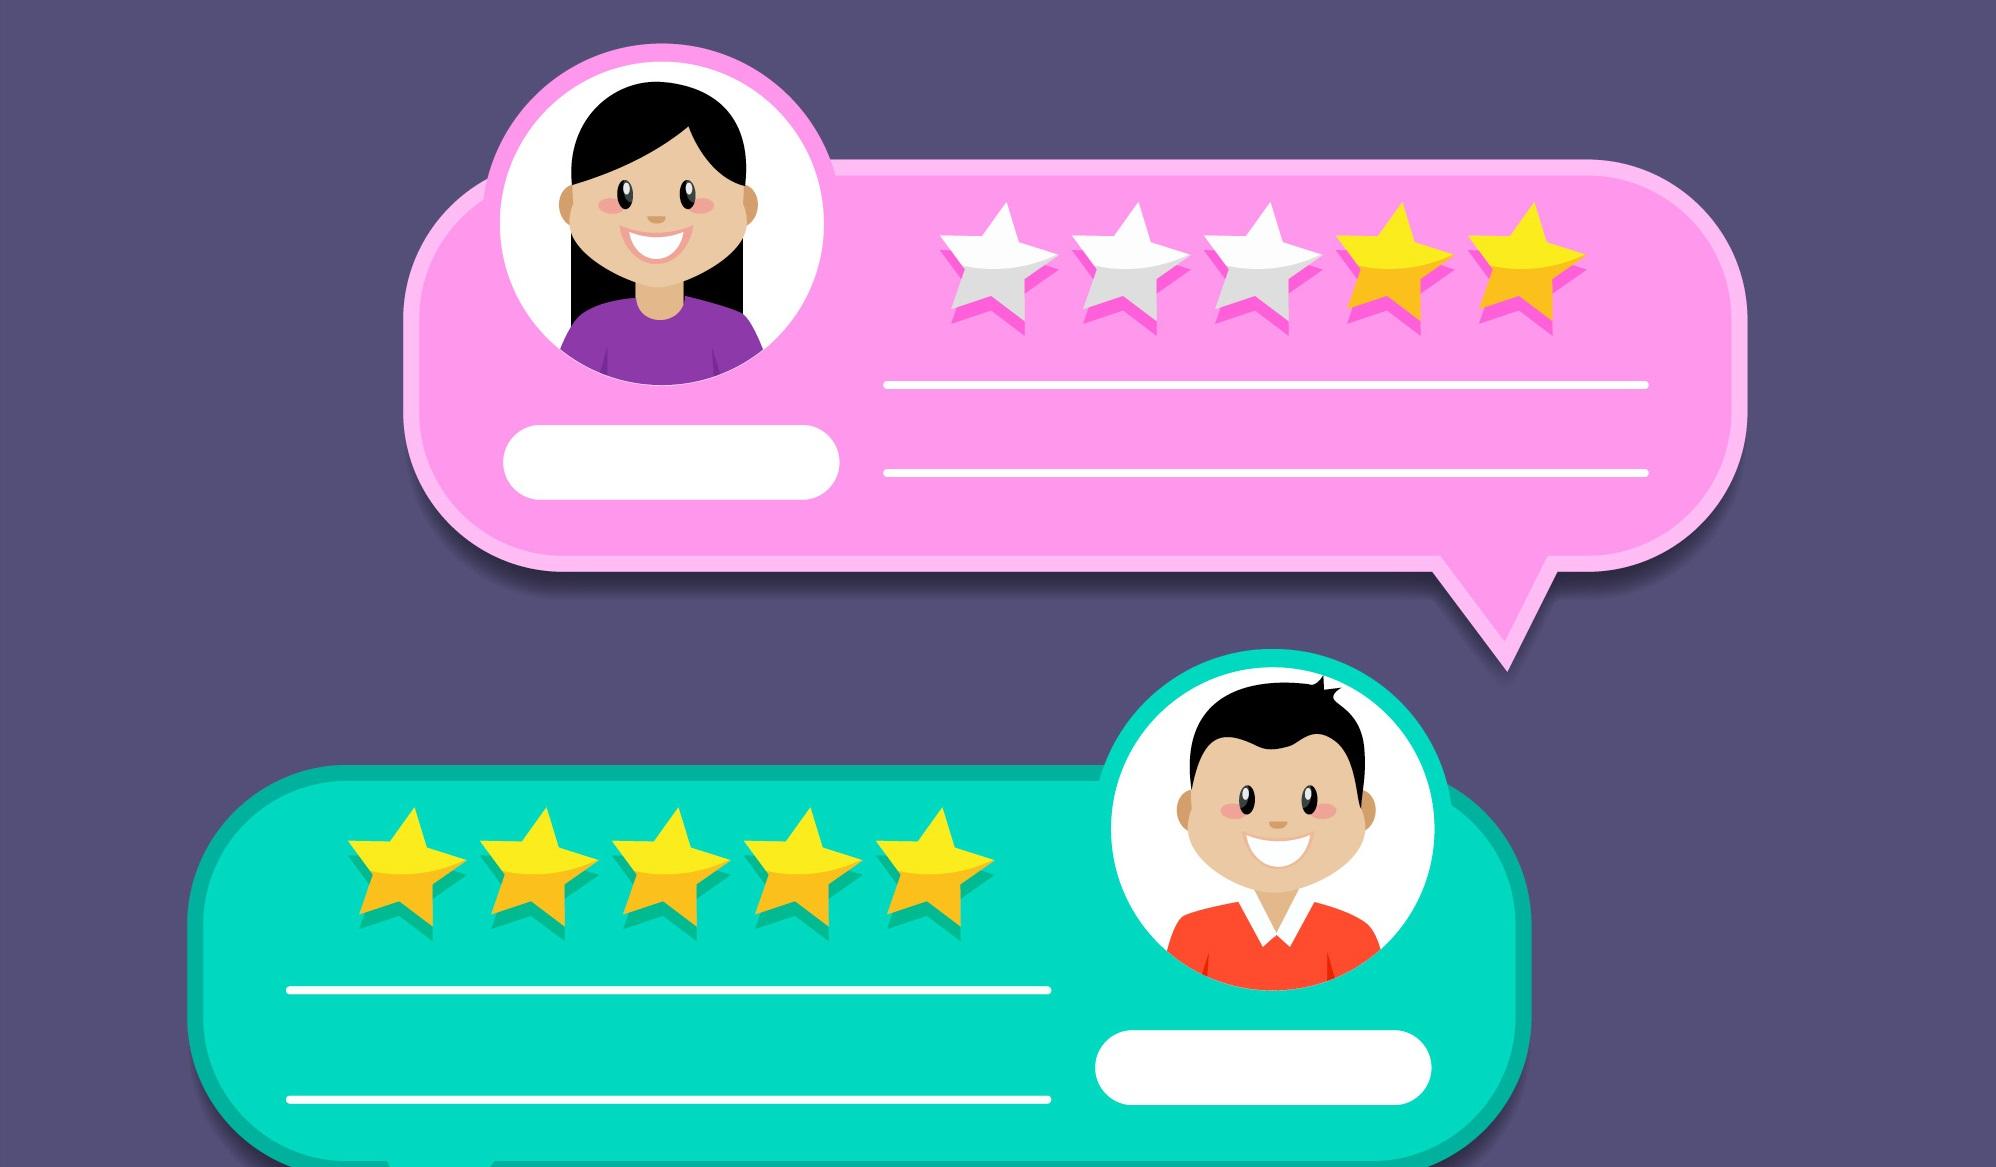 positive reviews, star ratings